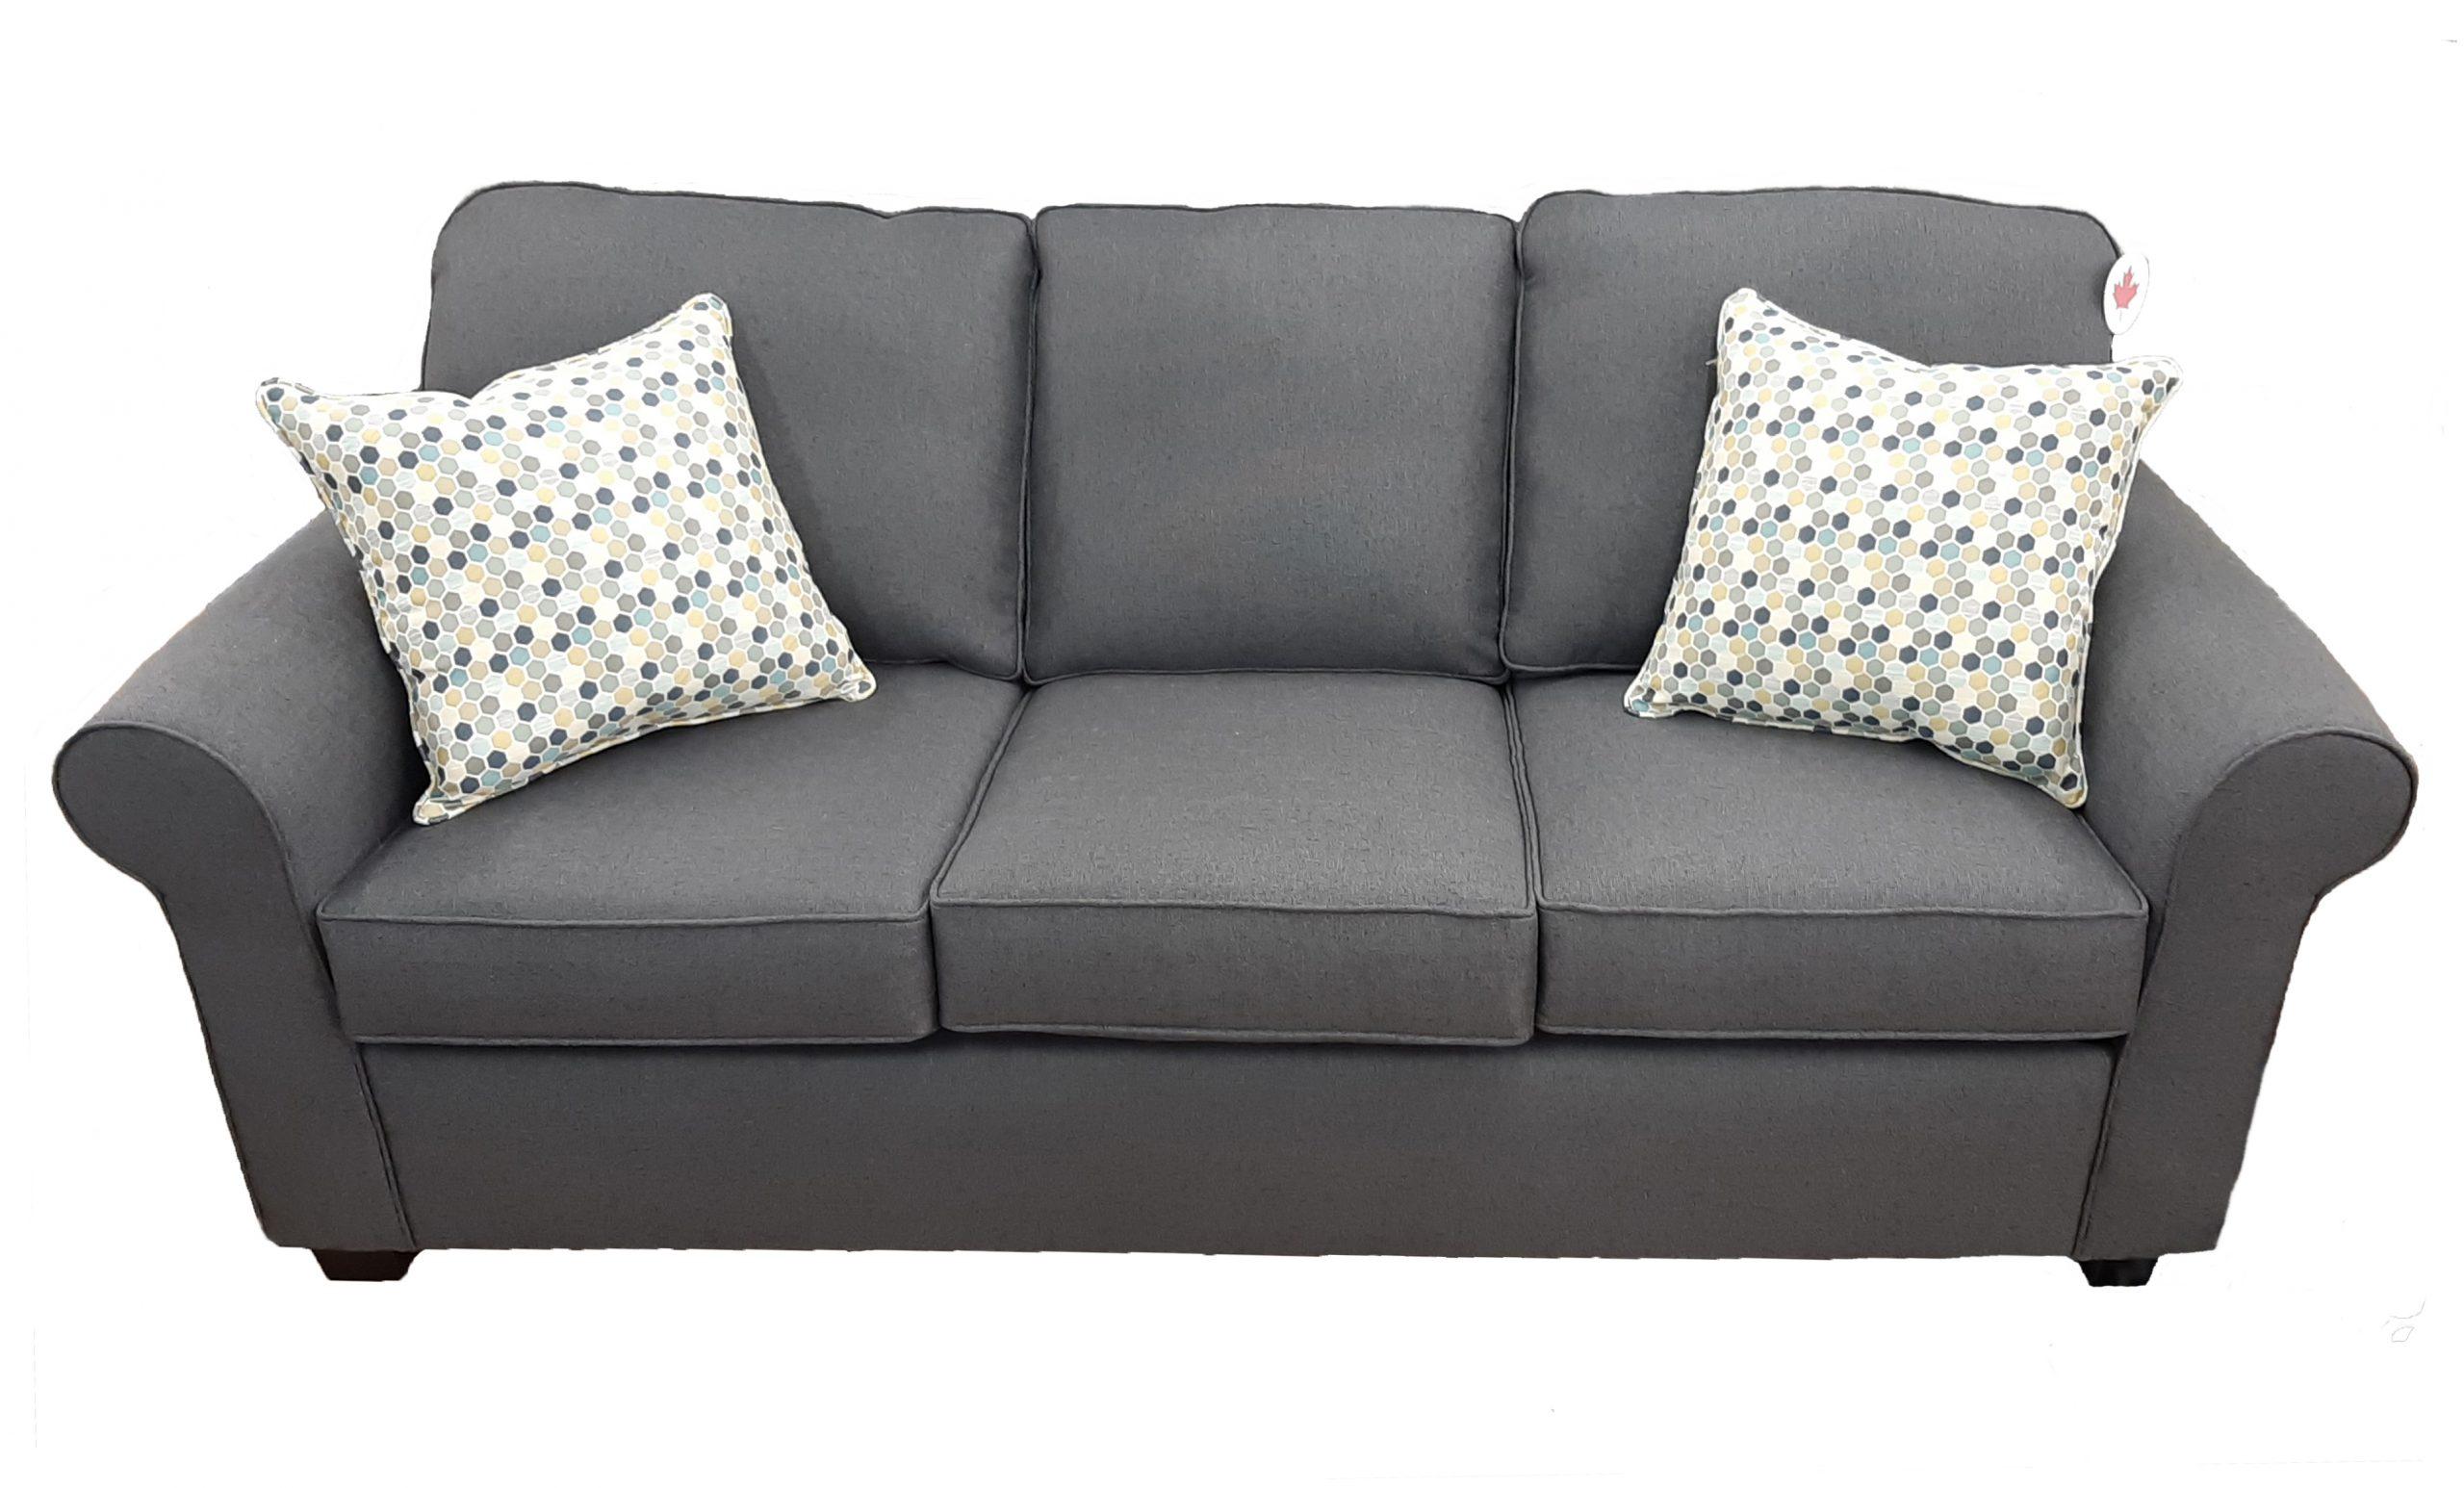 AC-2020 #16198B Dark Grey Sofa